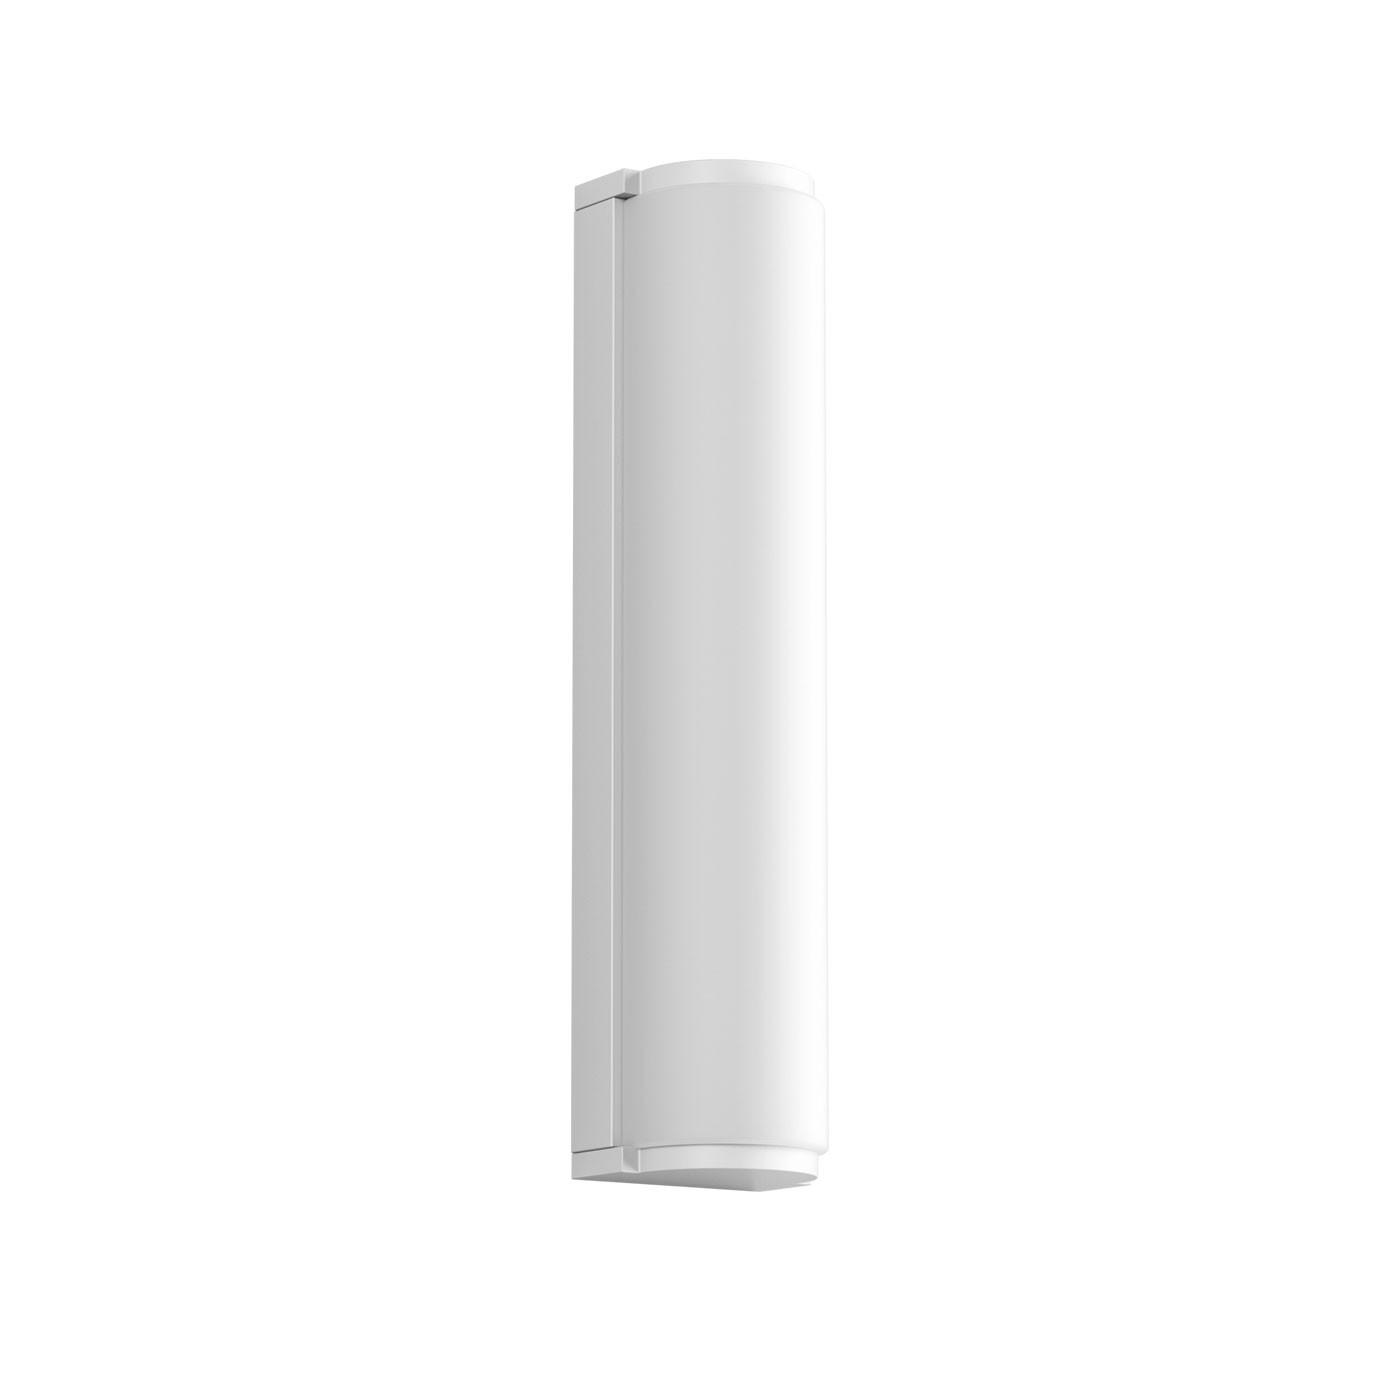 Bega 67682.1 / 67683.1 / 67684.1 wall lamp LED, white